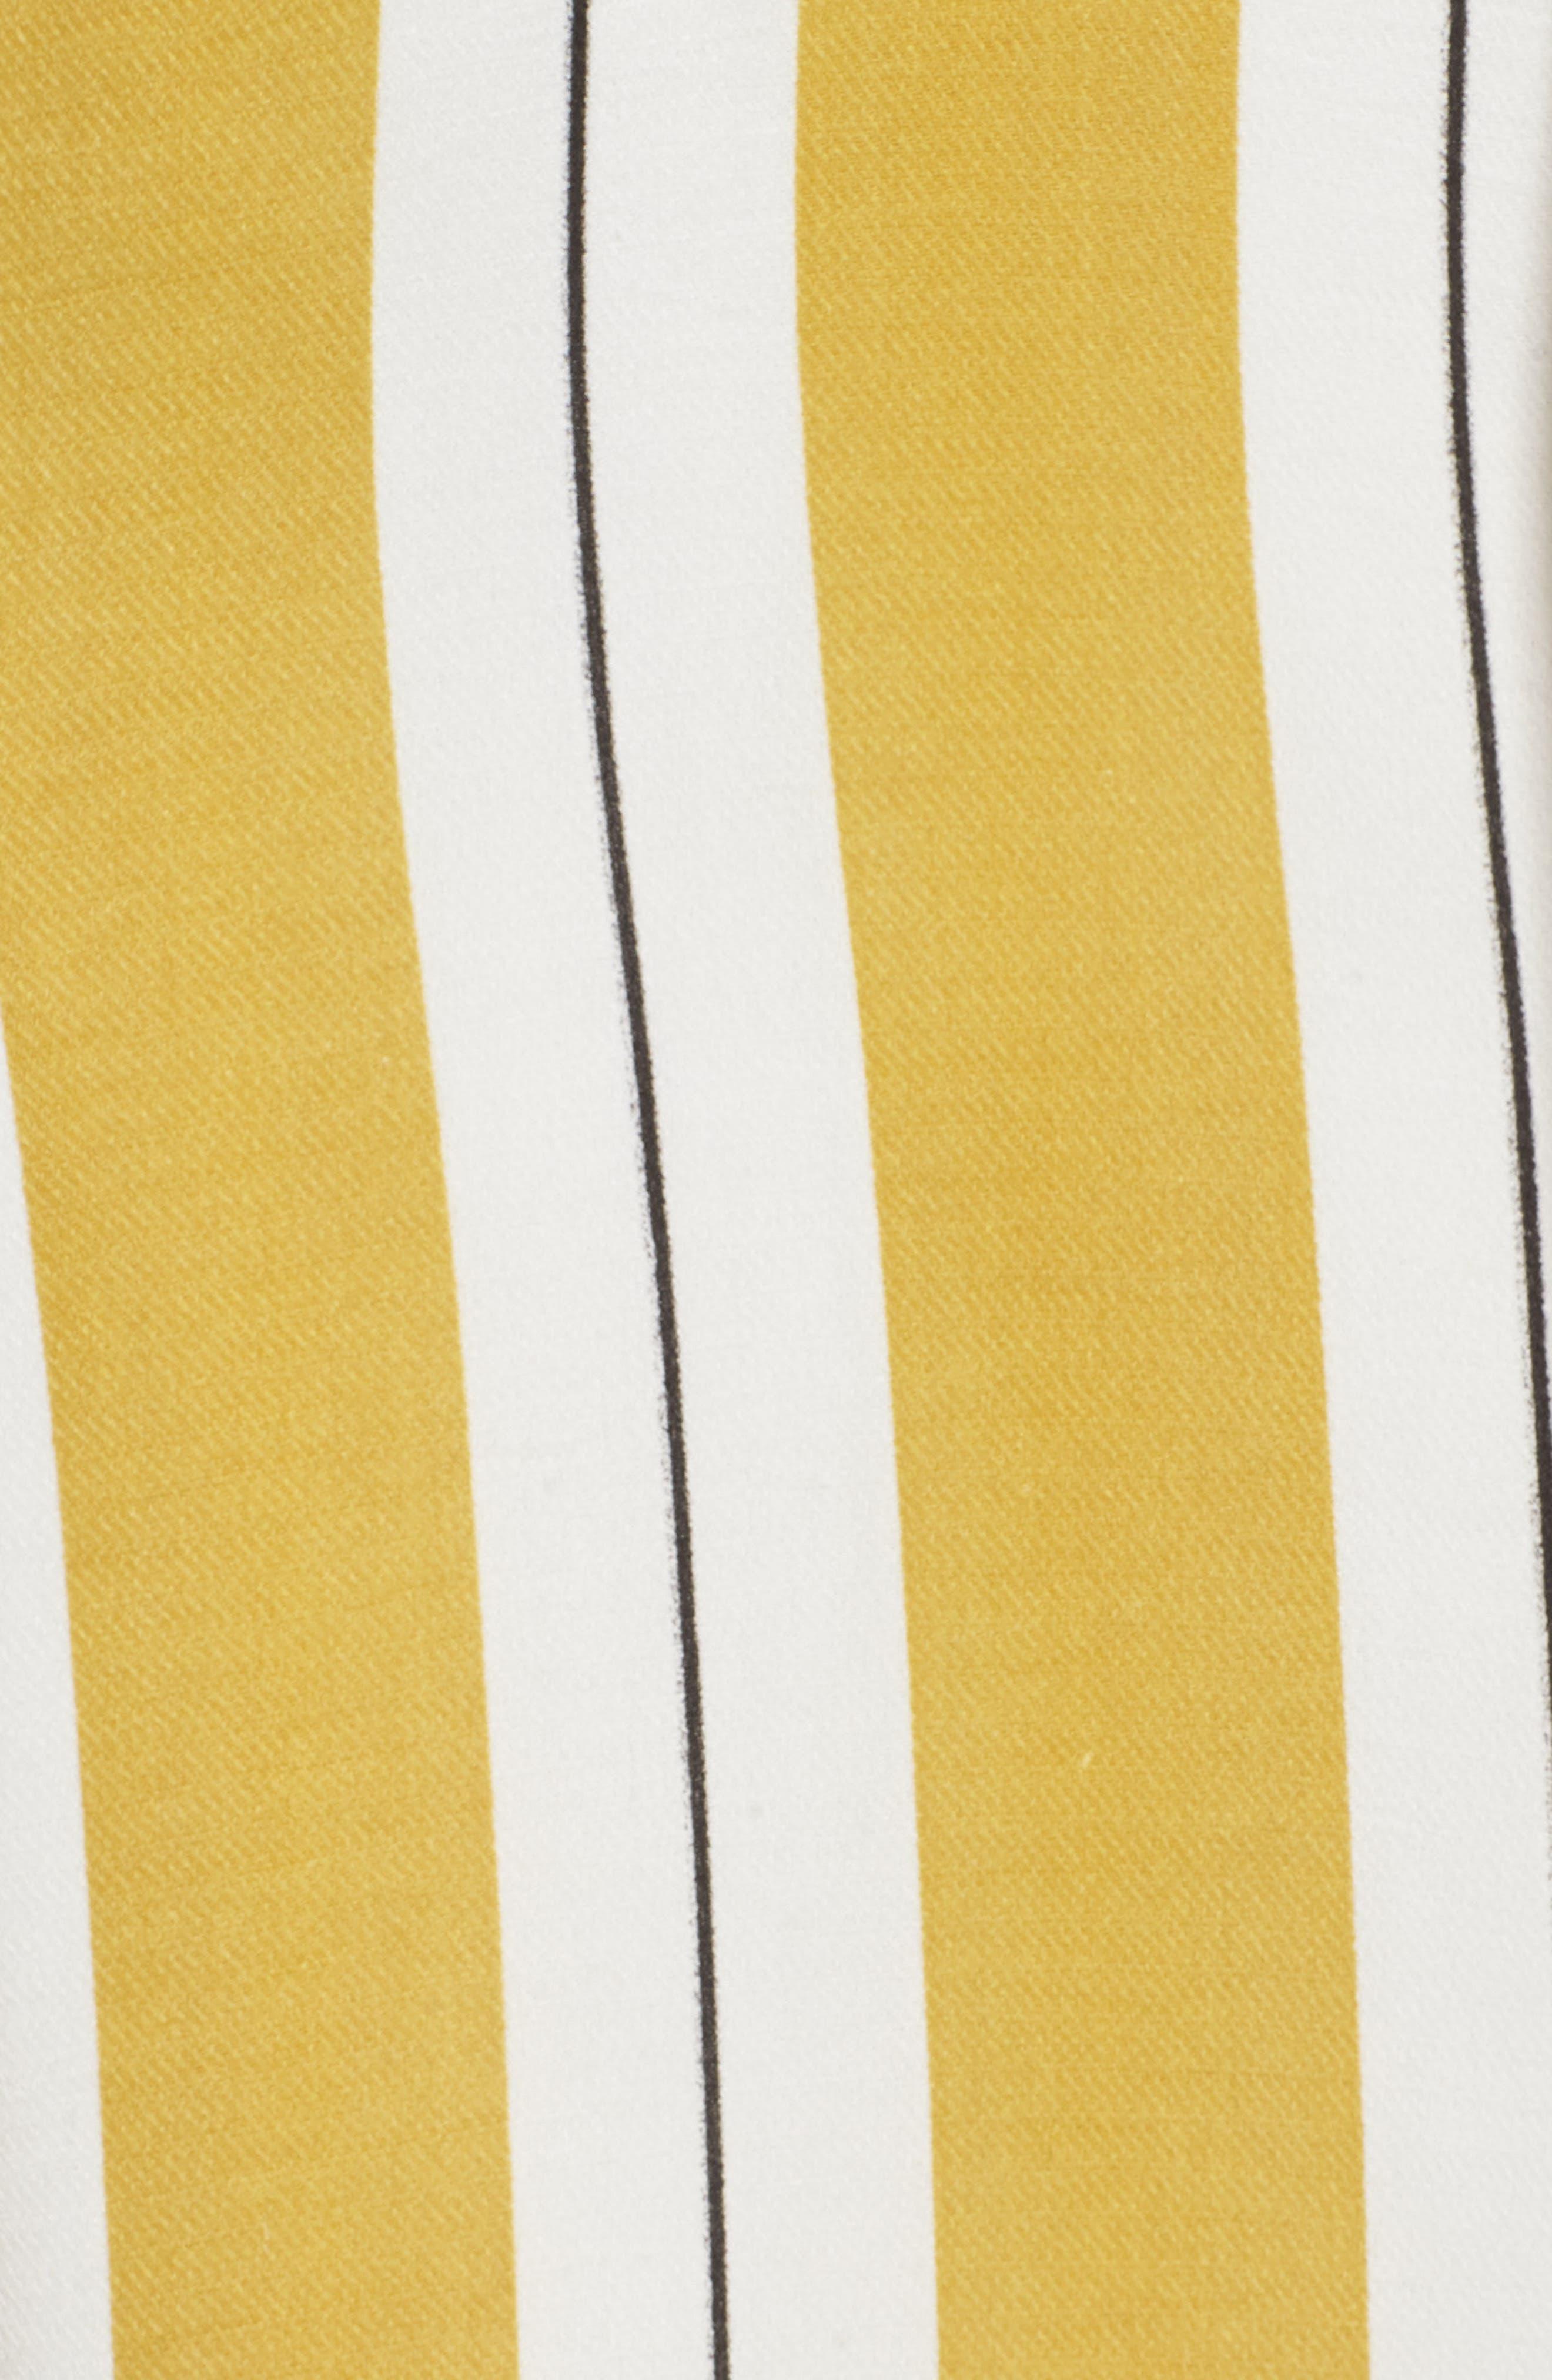 Stripe Midi Dress,                             Alternate thumbnail 7, color,                             Yellow Stripe Per Sample